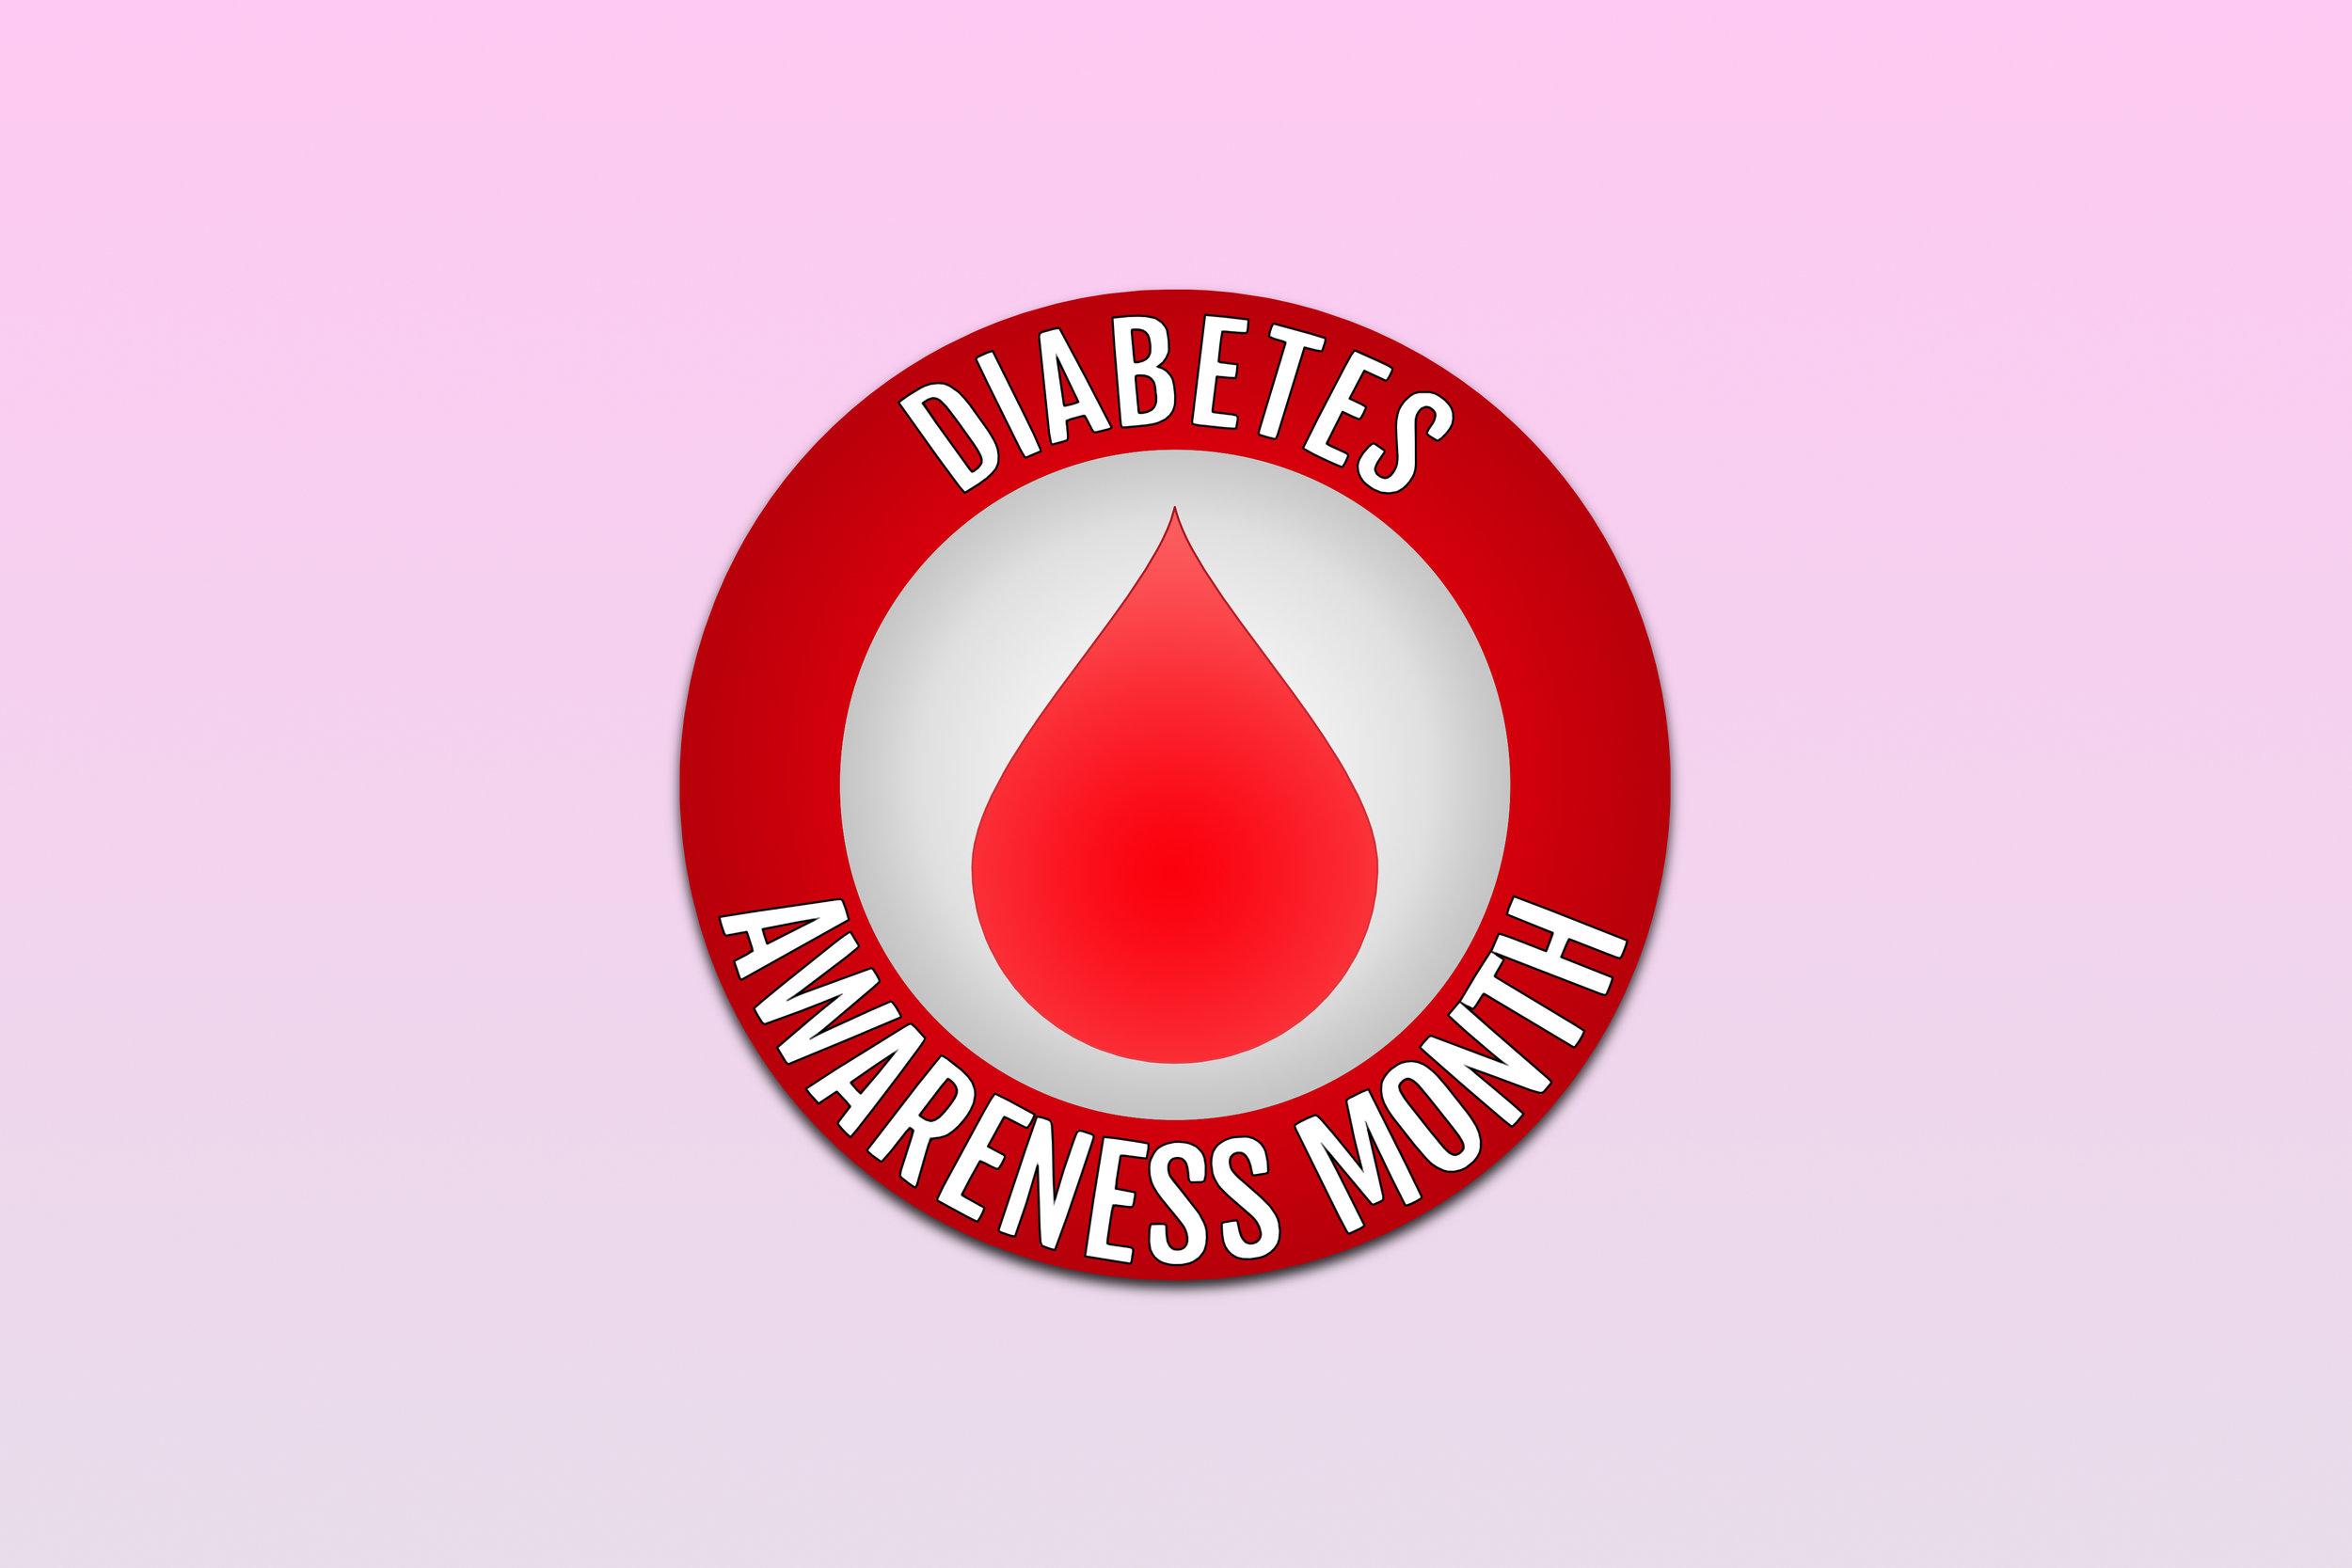 Diabetes Awareness Month.jpg